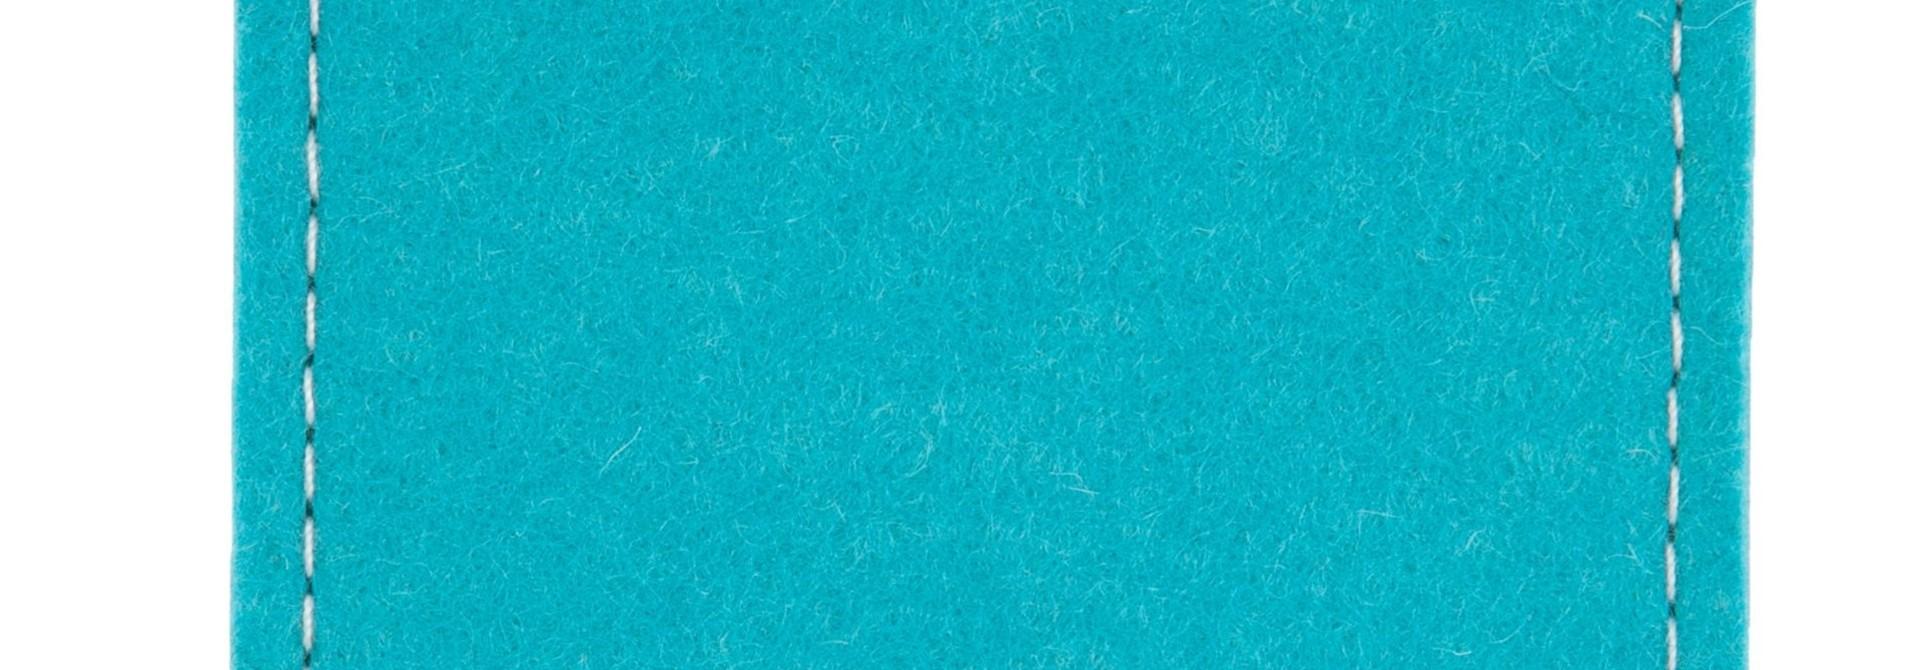 Galaxy Sleeve Turquoise